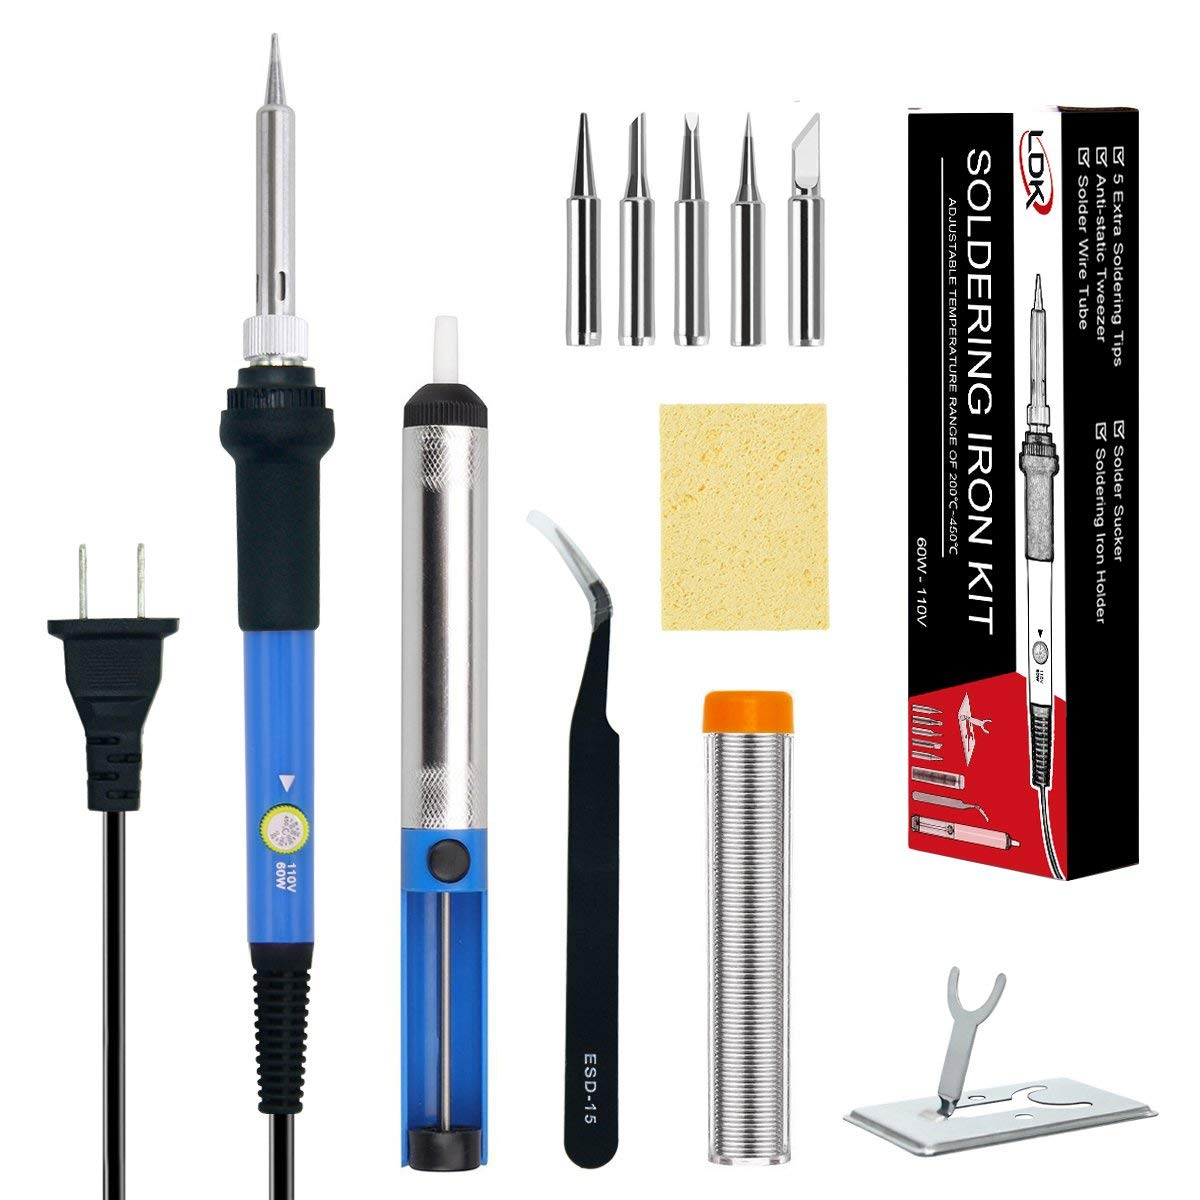 LDK Soldering Iron, Soldering Iron Kit Electronics 60W 110V Adjustable Temperature Welding Tool with 5pcs Different Tips, Stand, Tweezers, Sponge, Desoldering Pump and Solder Wire Tube (Blue)